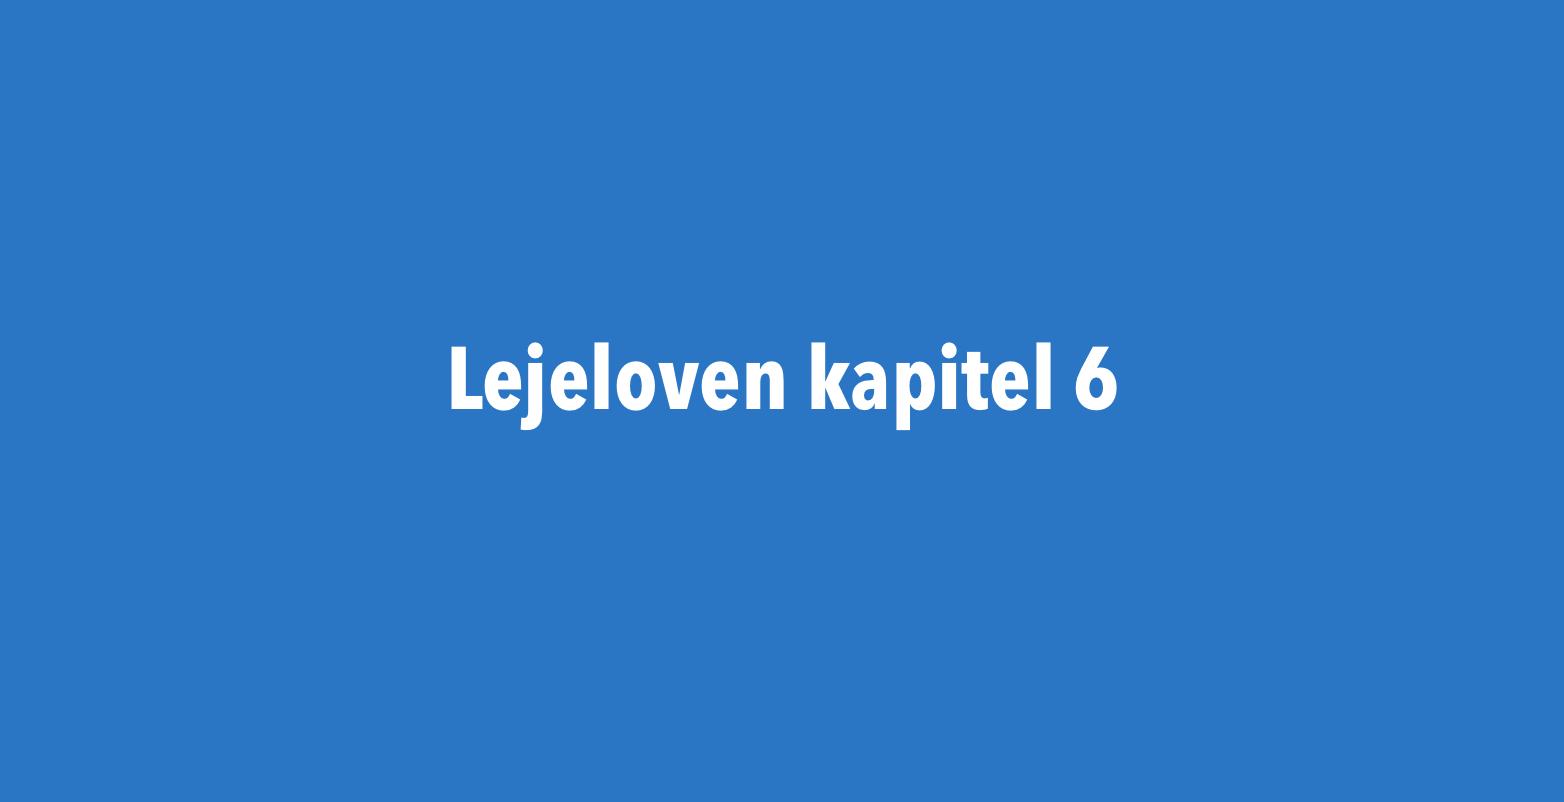 Lejelovens kapital 6